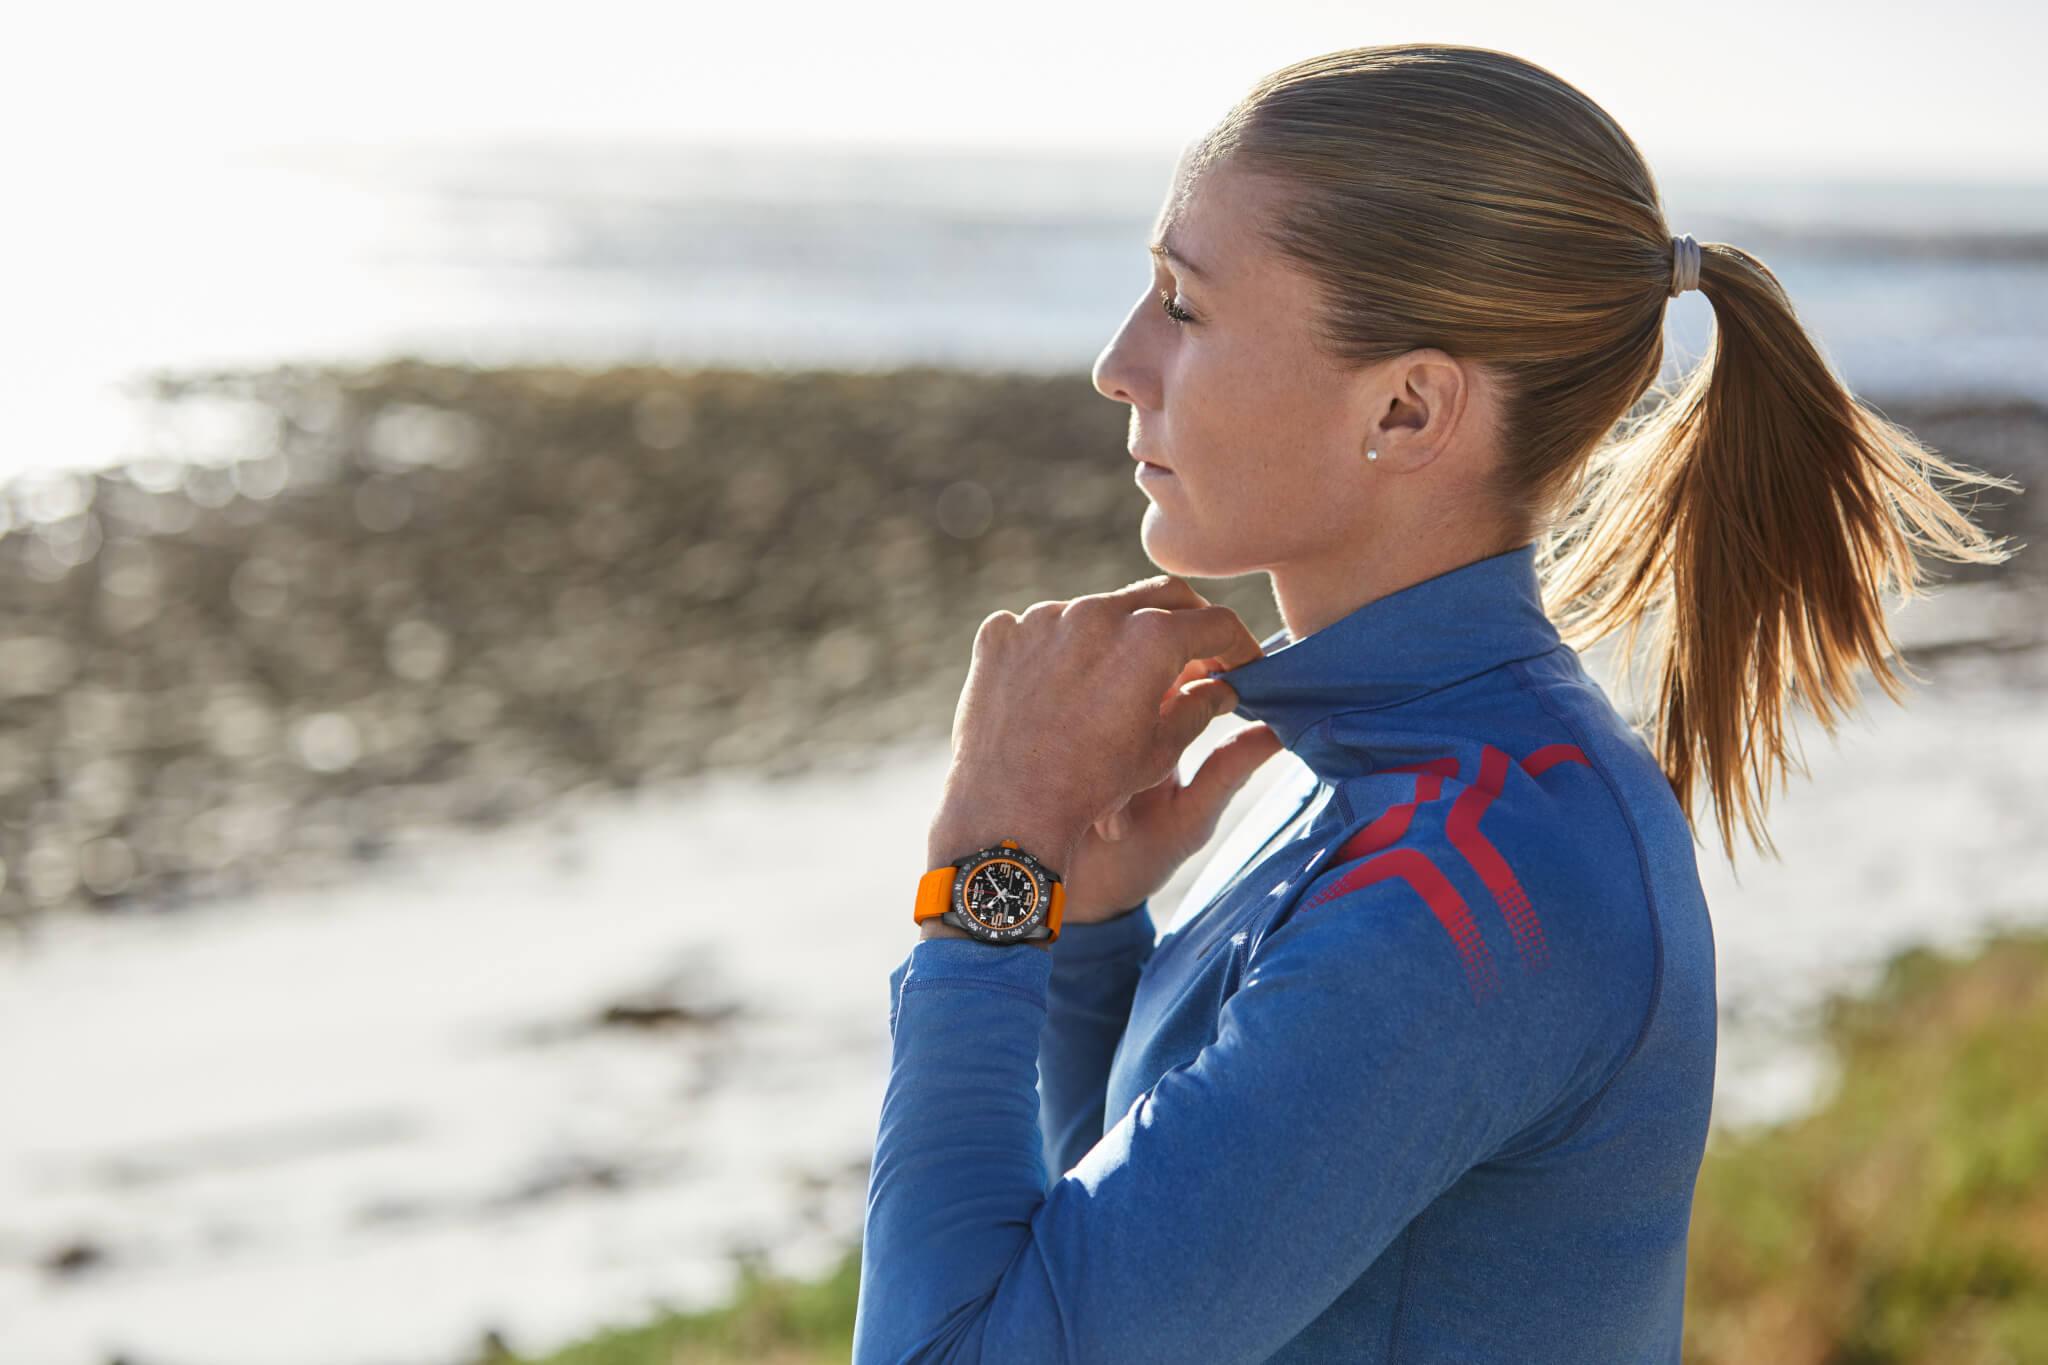 Triathlon Squad member Daniela Ryf wearing the new Endurance Pro